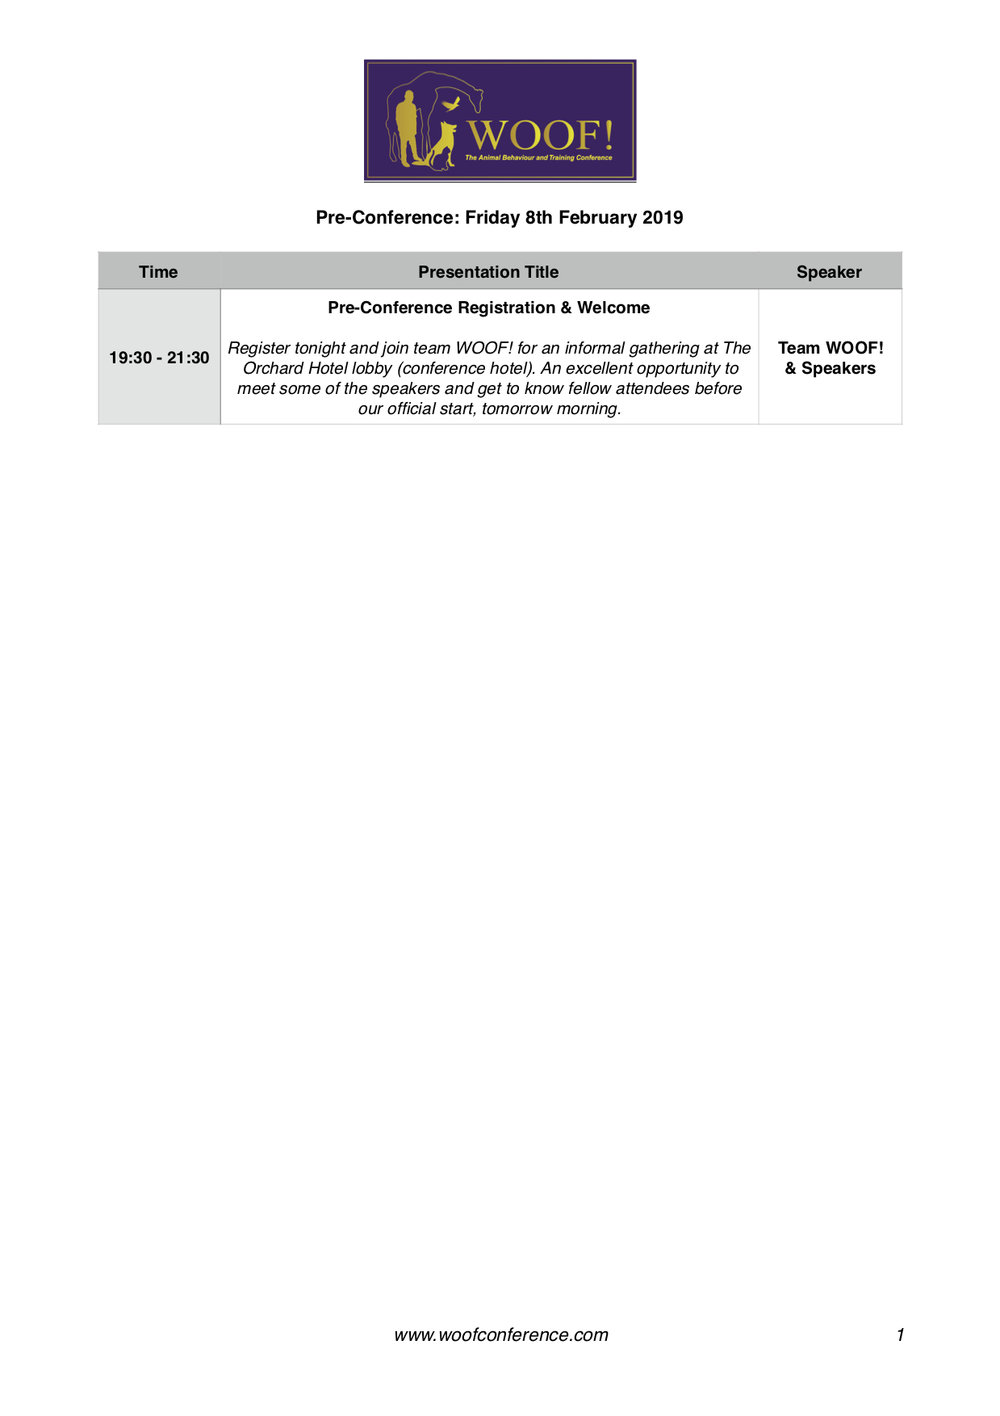 WOOF! 2019 Schedule Public 1.0 Page 1.jpg